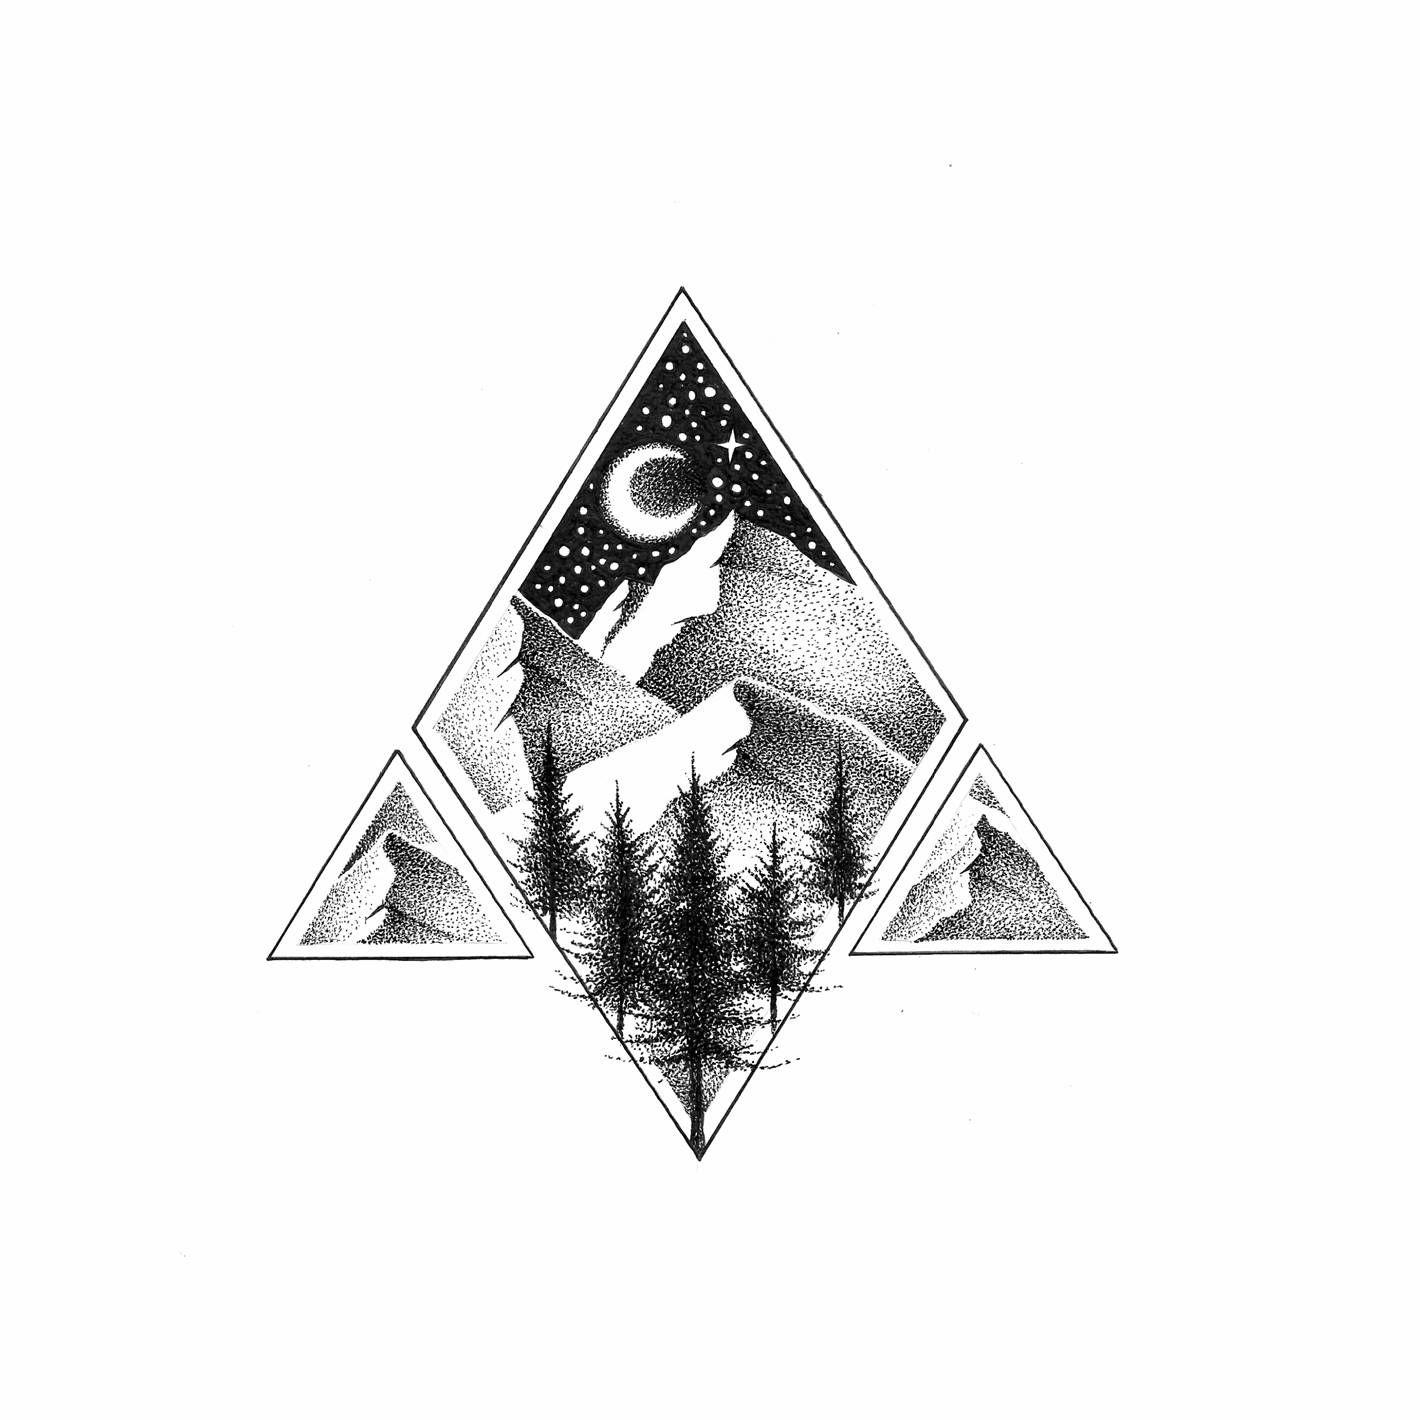 NORTHERN MOUNTAINS III ORIGINAL ILLUSTRATION Copic